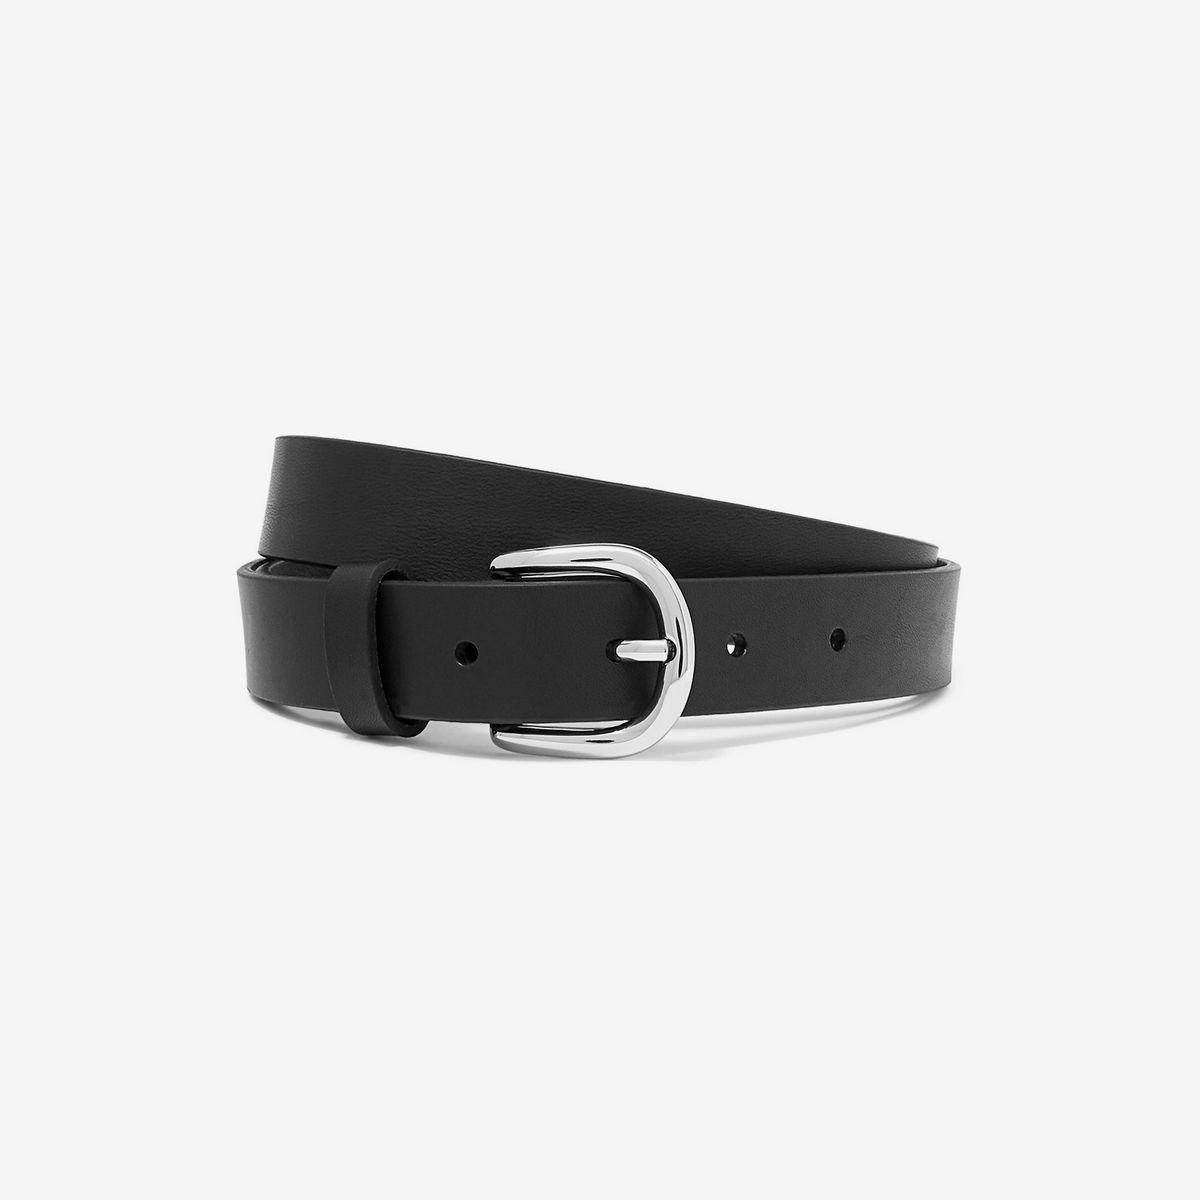 Handmade Black Leather Logo Belts Fashion Leather Steel Accessory Buckle Belts